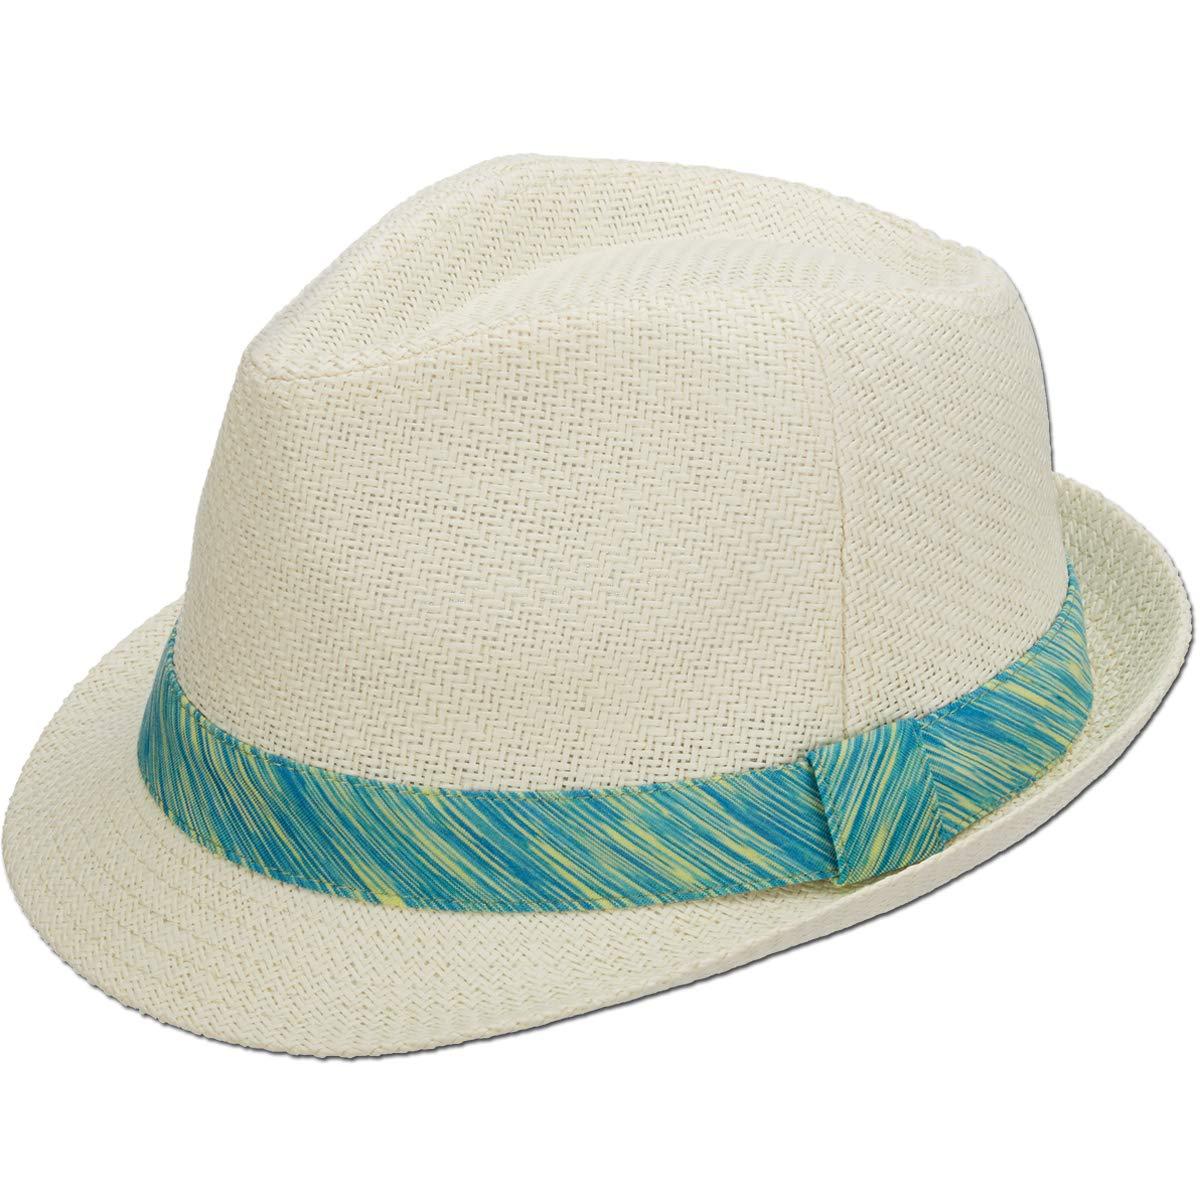 Amazon.com  Panama Jack Women s Fedora Hat - Lightweight Matte Toyo Straw 3d9802d8960